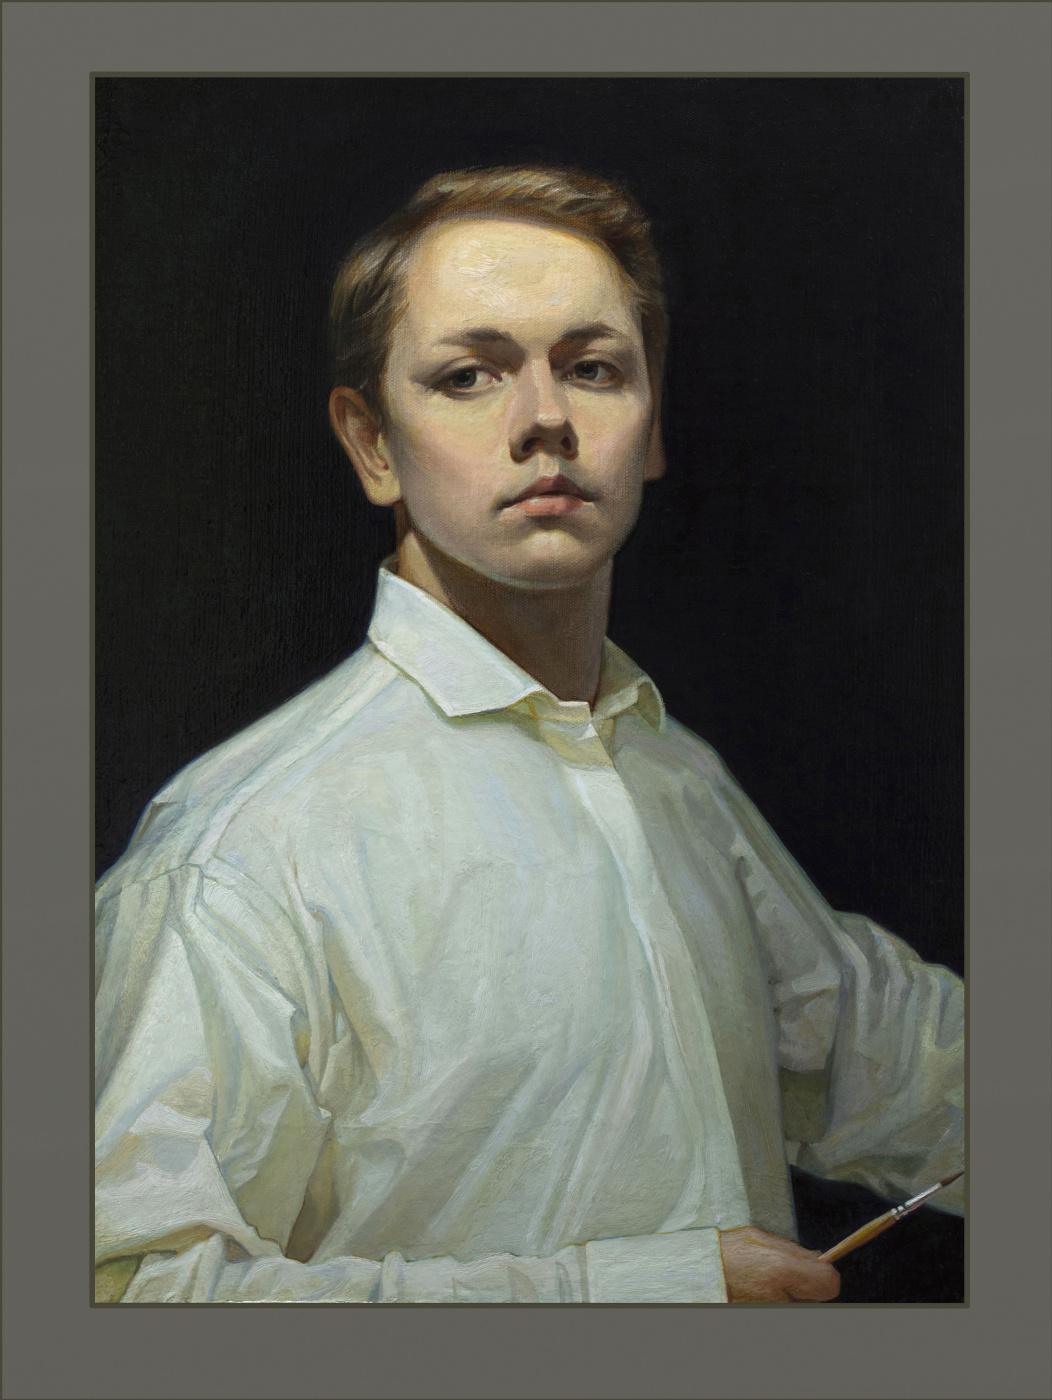 Sushienok64 @ mail.ru Mikhailovich Sushenok Igor. Self-portrait